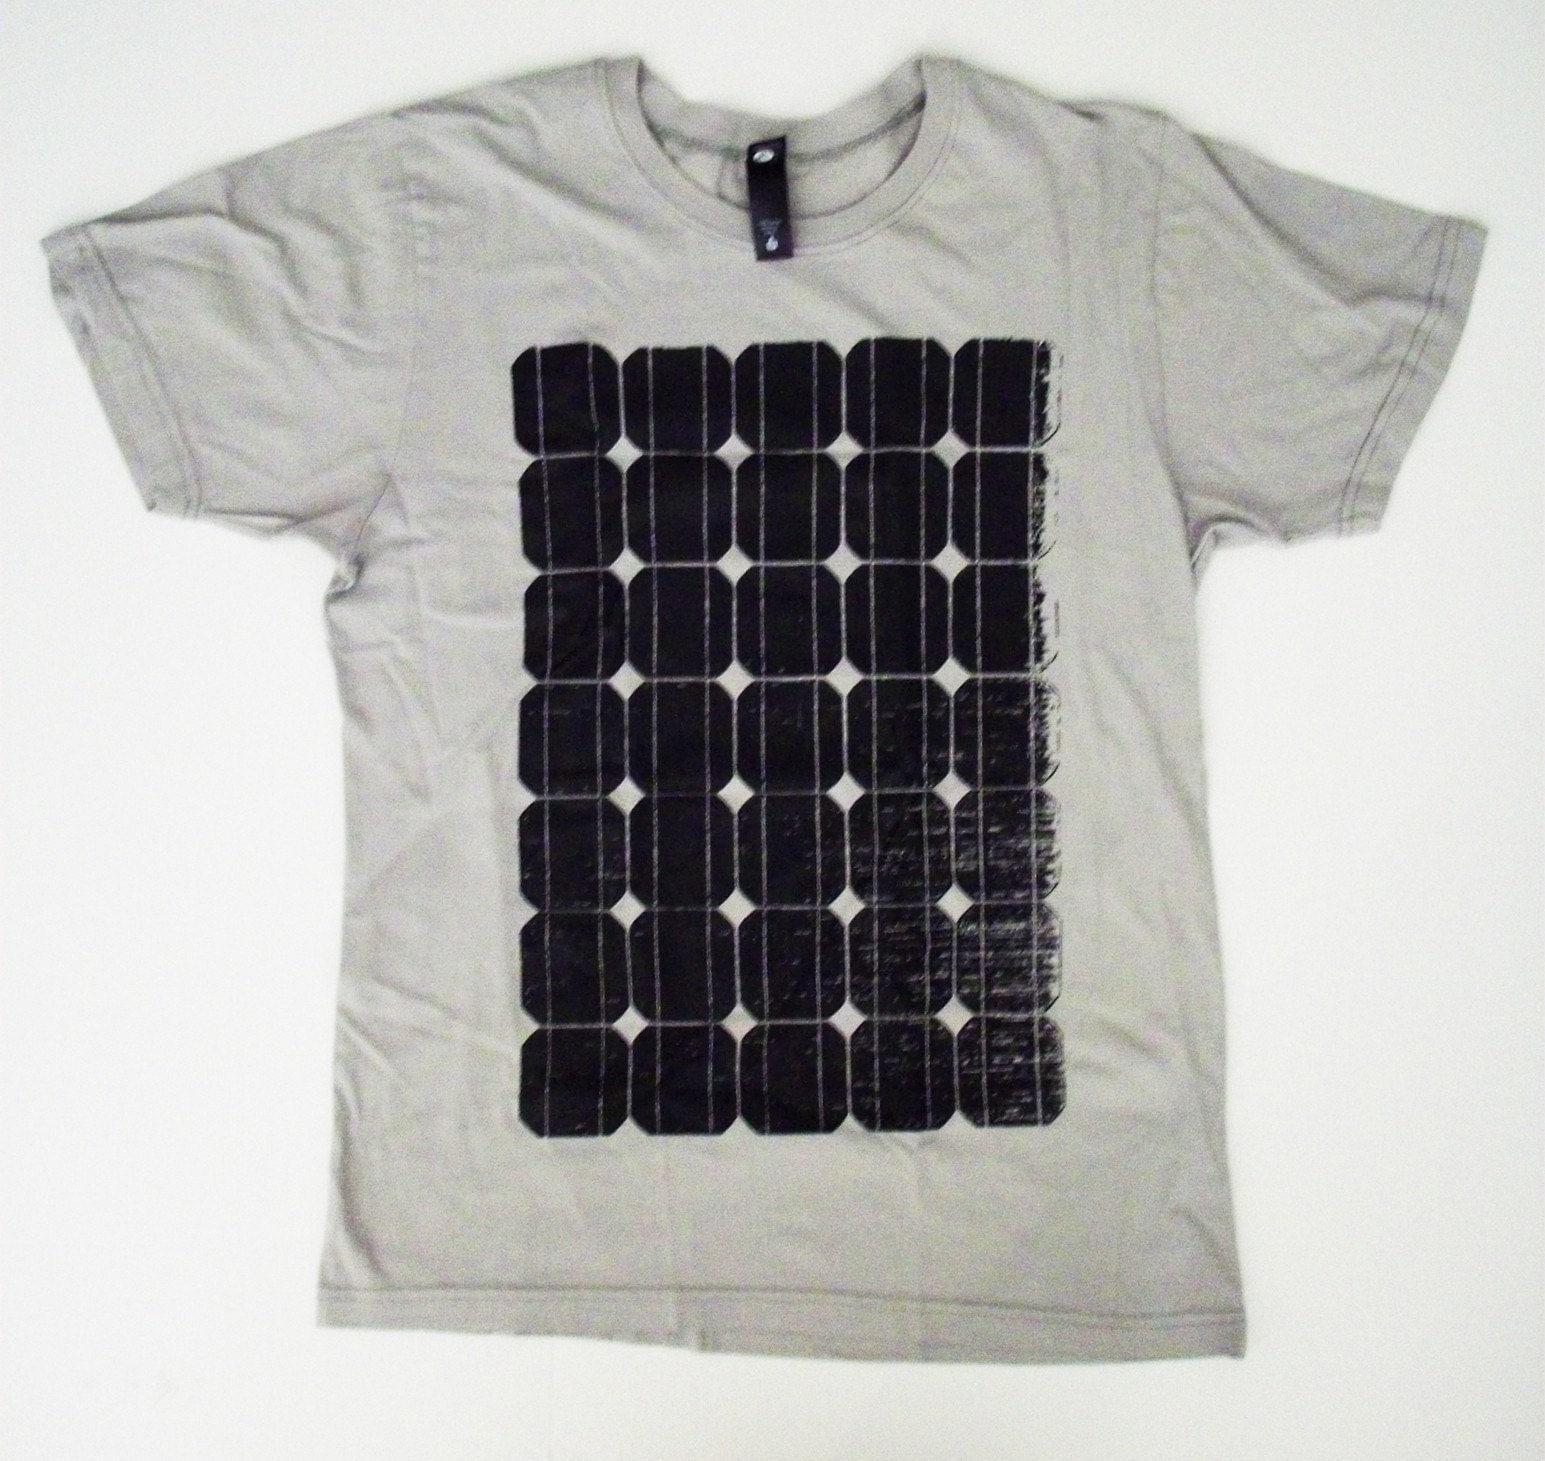 SOLAR PANEL T  SHIRT S, M. L. XL  alternative apparel energy green